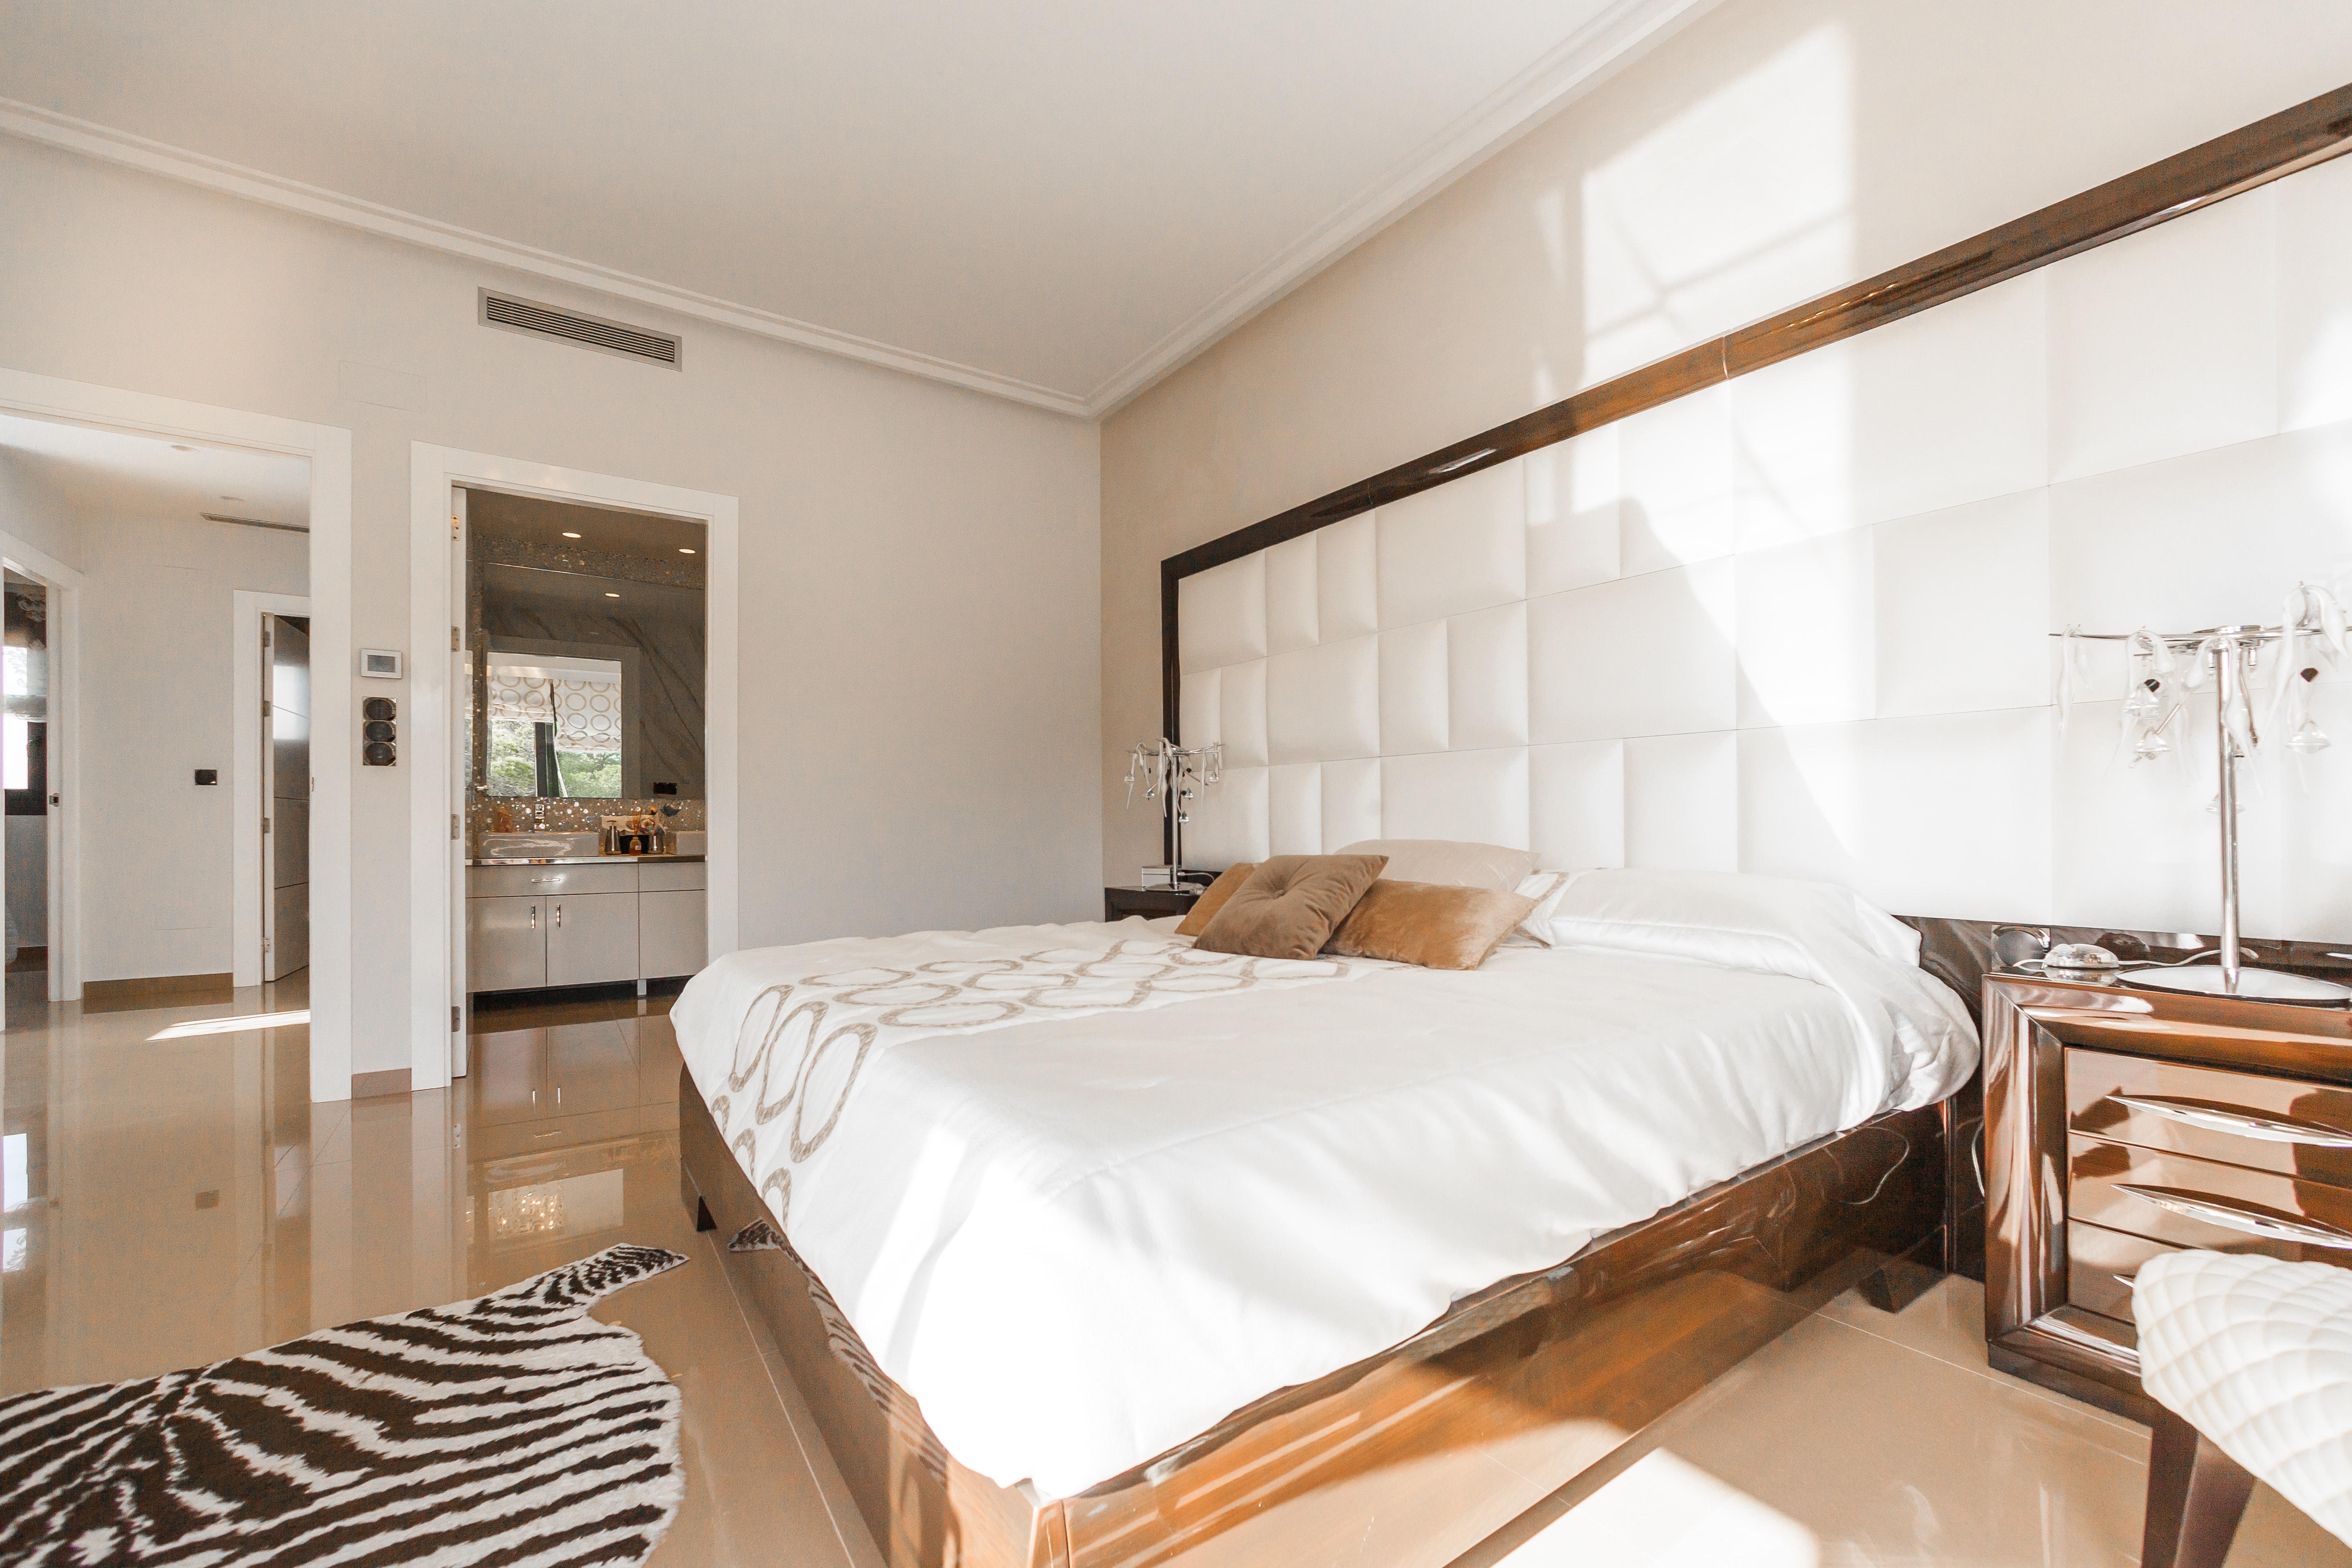 fundamenta otthonok s megold sok im dnival tet t ri h l szob k inspir l k pgal ria. Black Bedroom Furniture Sets. Home Design Ideas